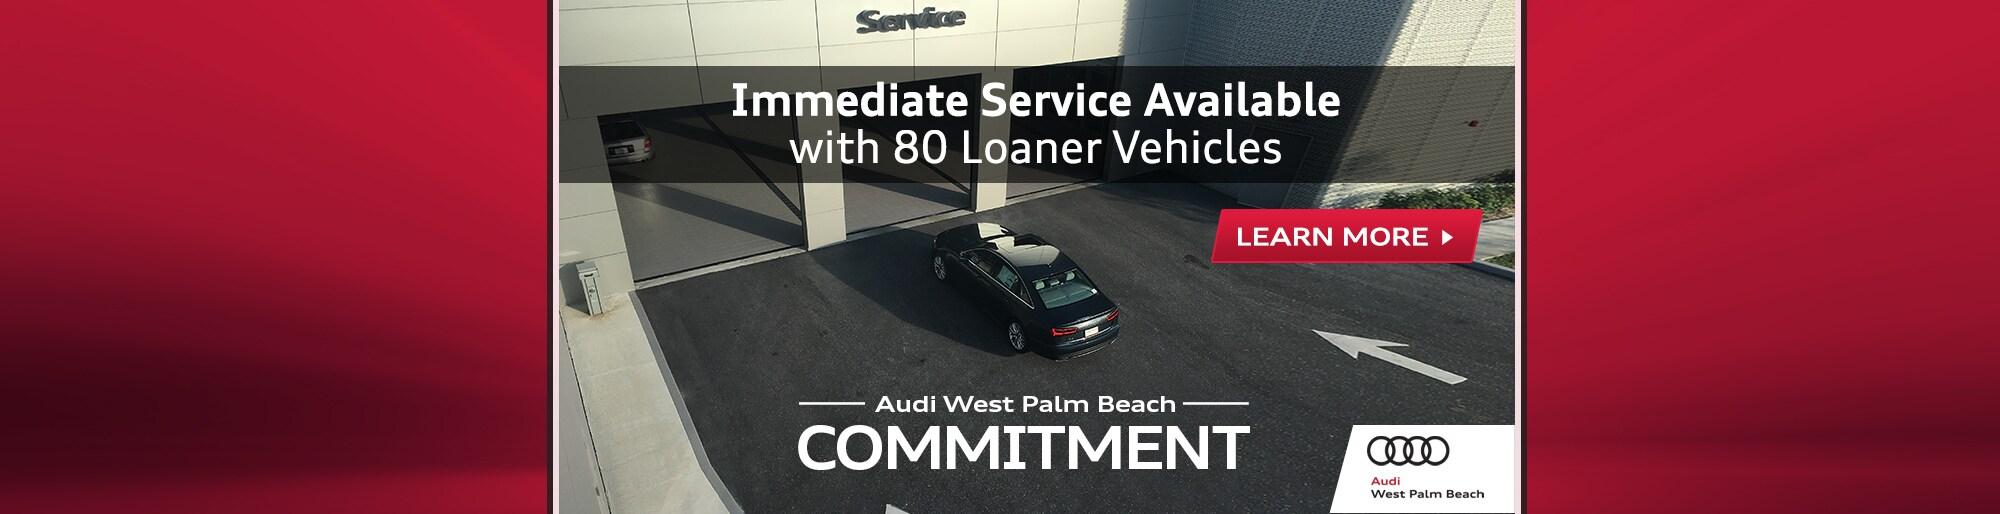 Audi West Palm Beach Photos Audi Collections - Braman audi